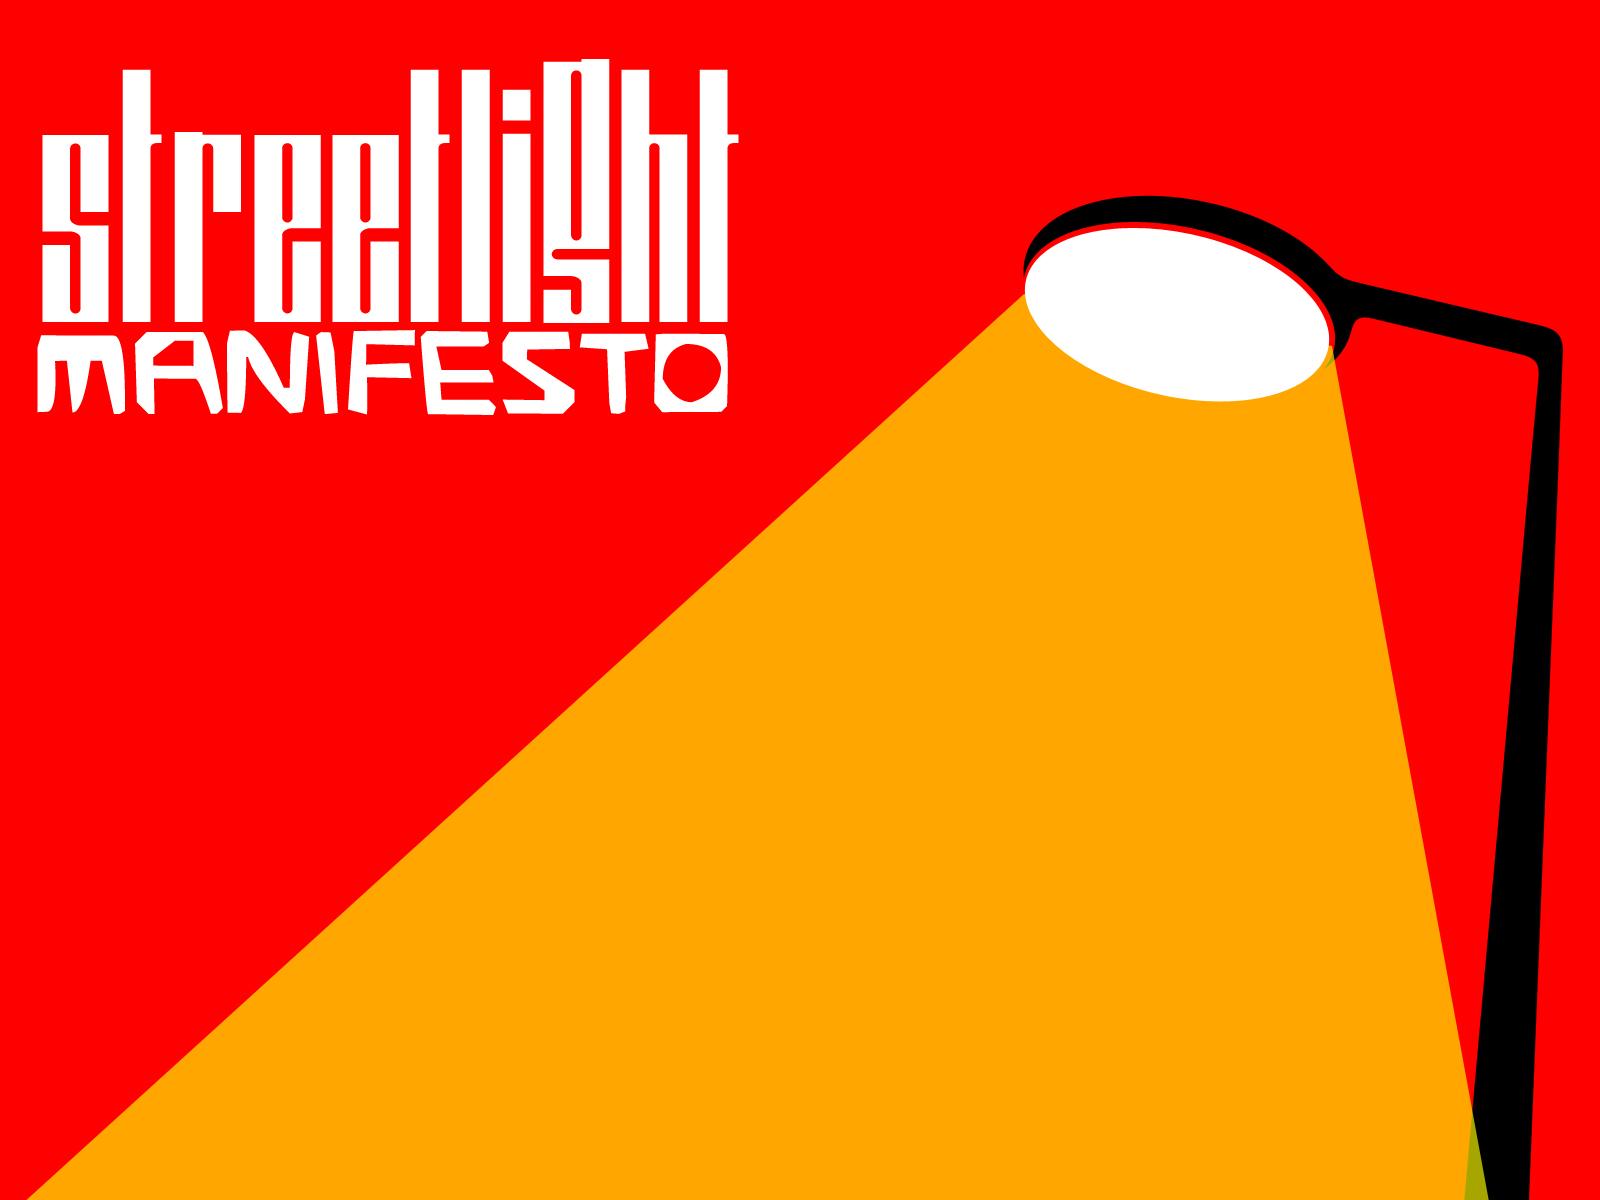 StreetlightManifesto Wallpaper by tlackattack on DeviantArt Streetlight Manifesto Wallpaper